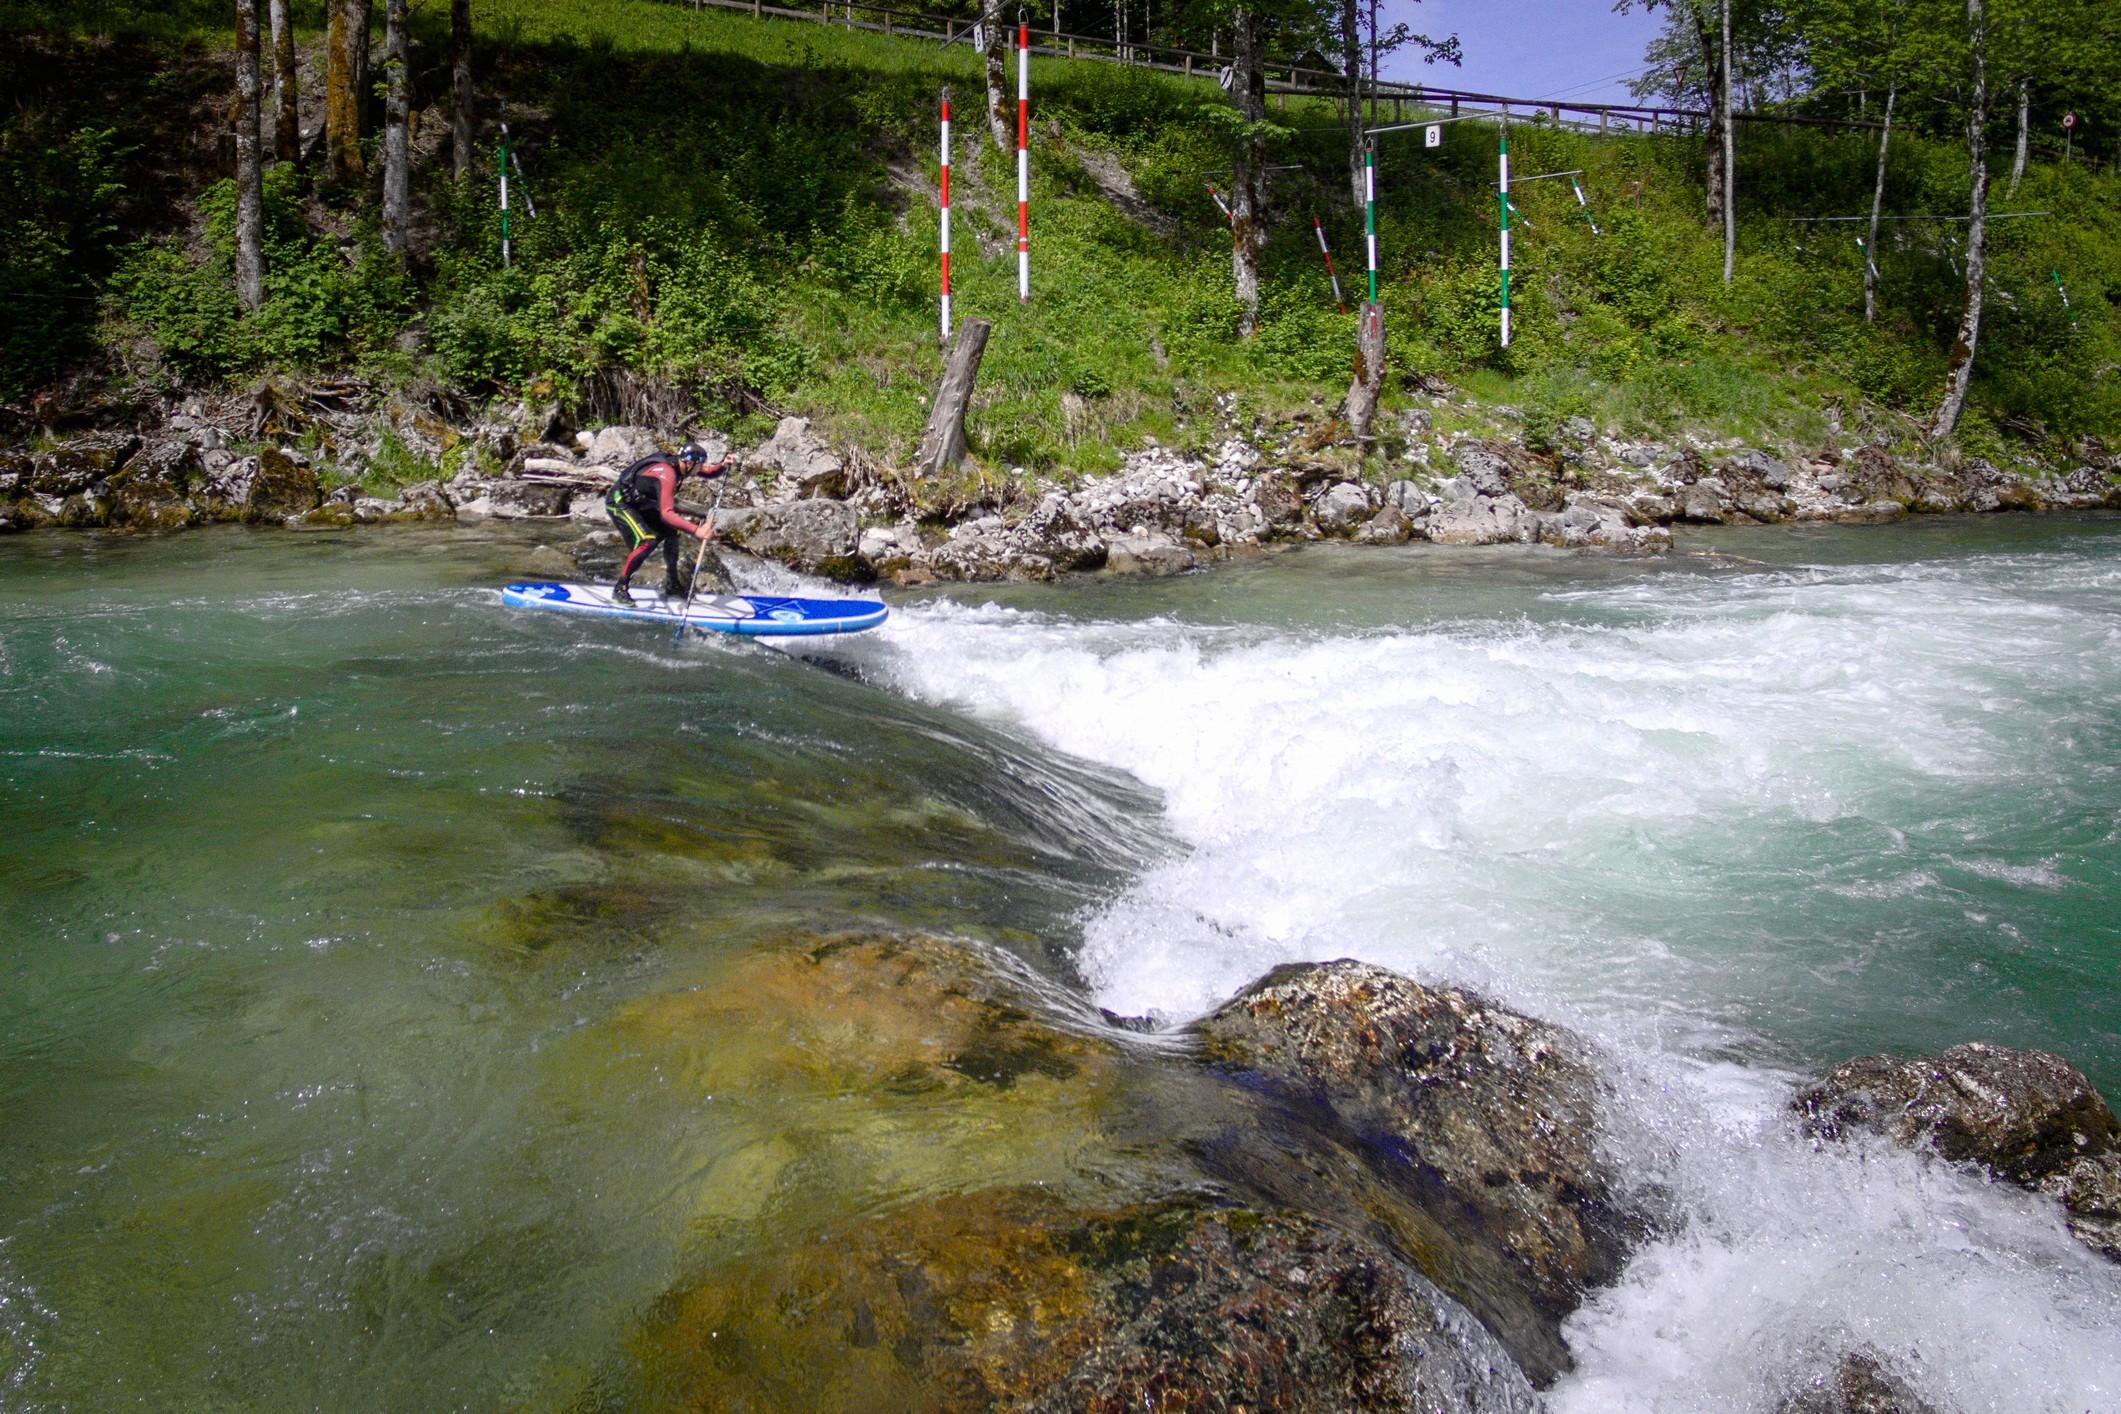 Austria: Wildalpen Slalom Course